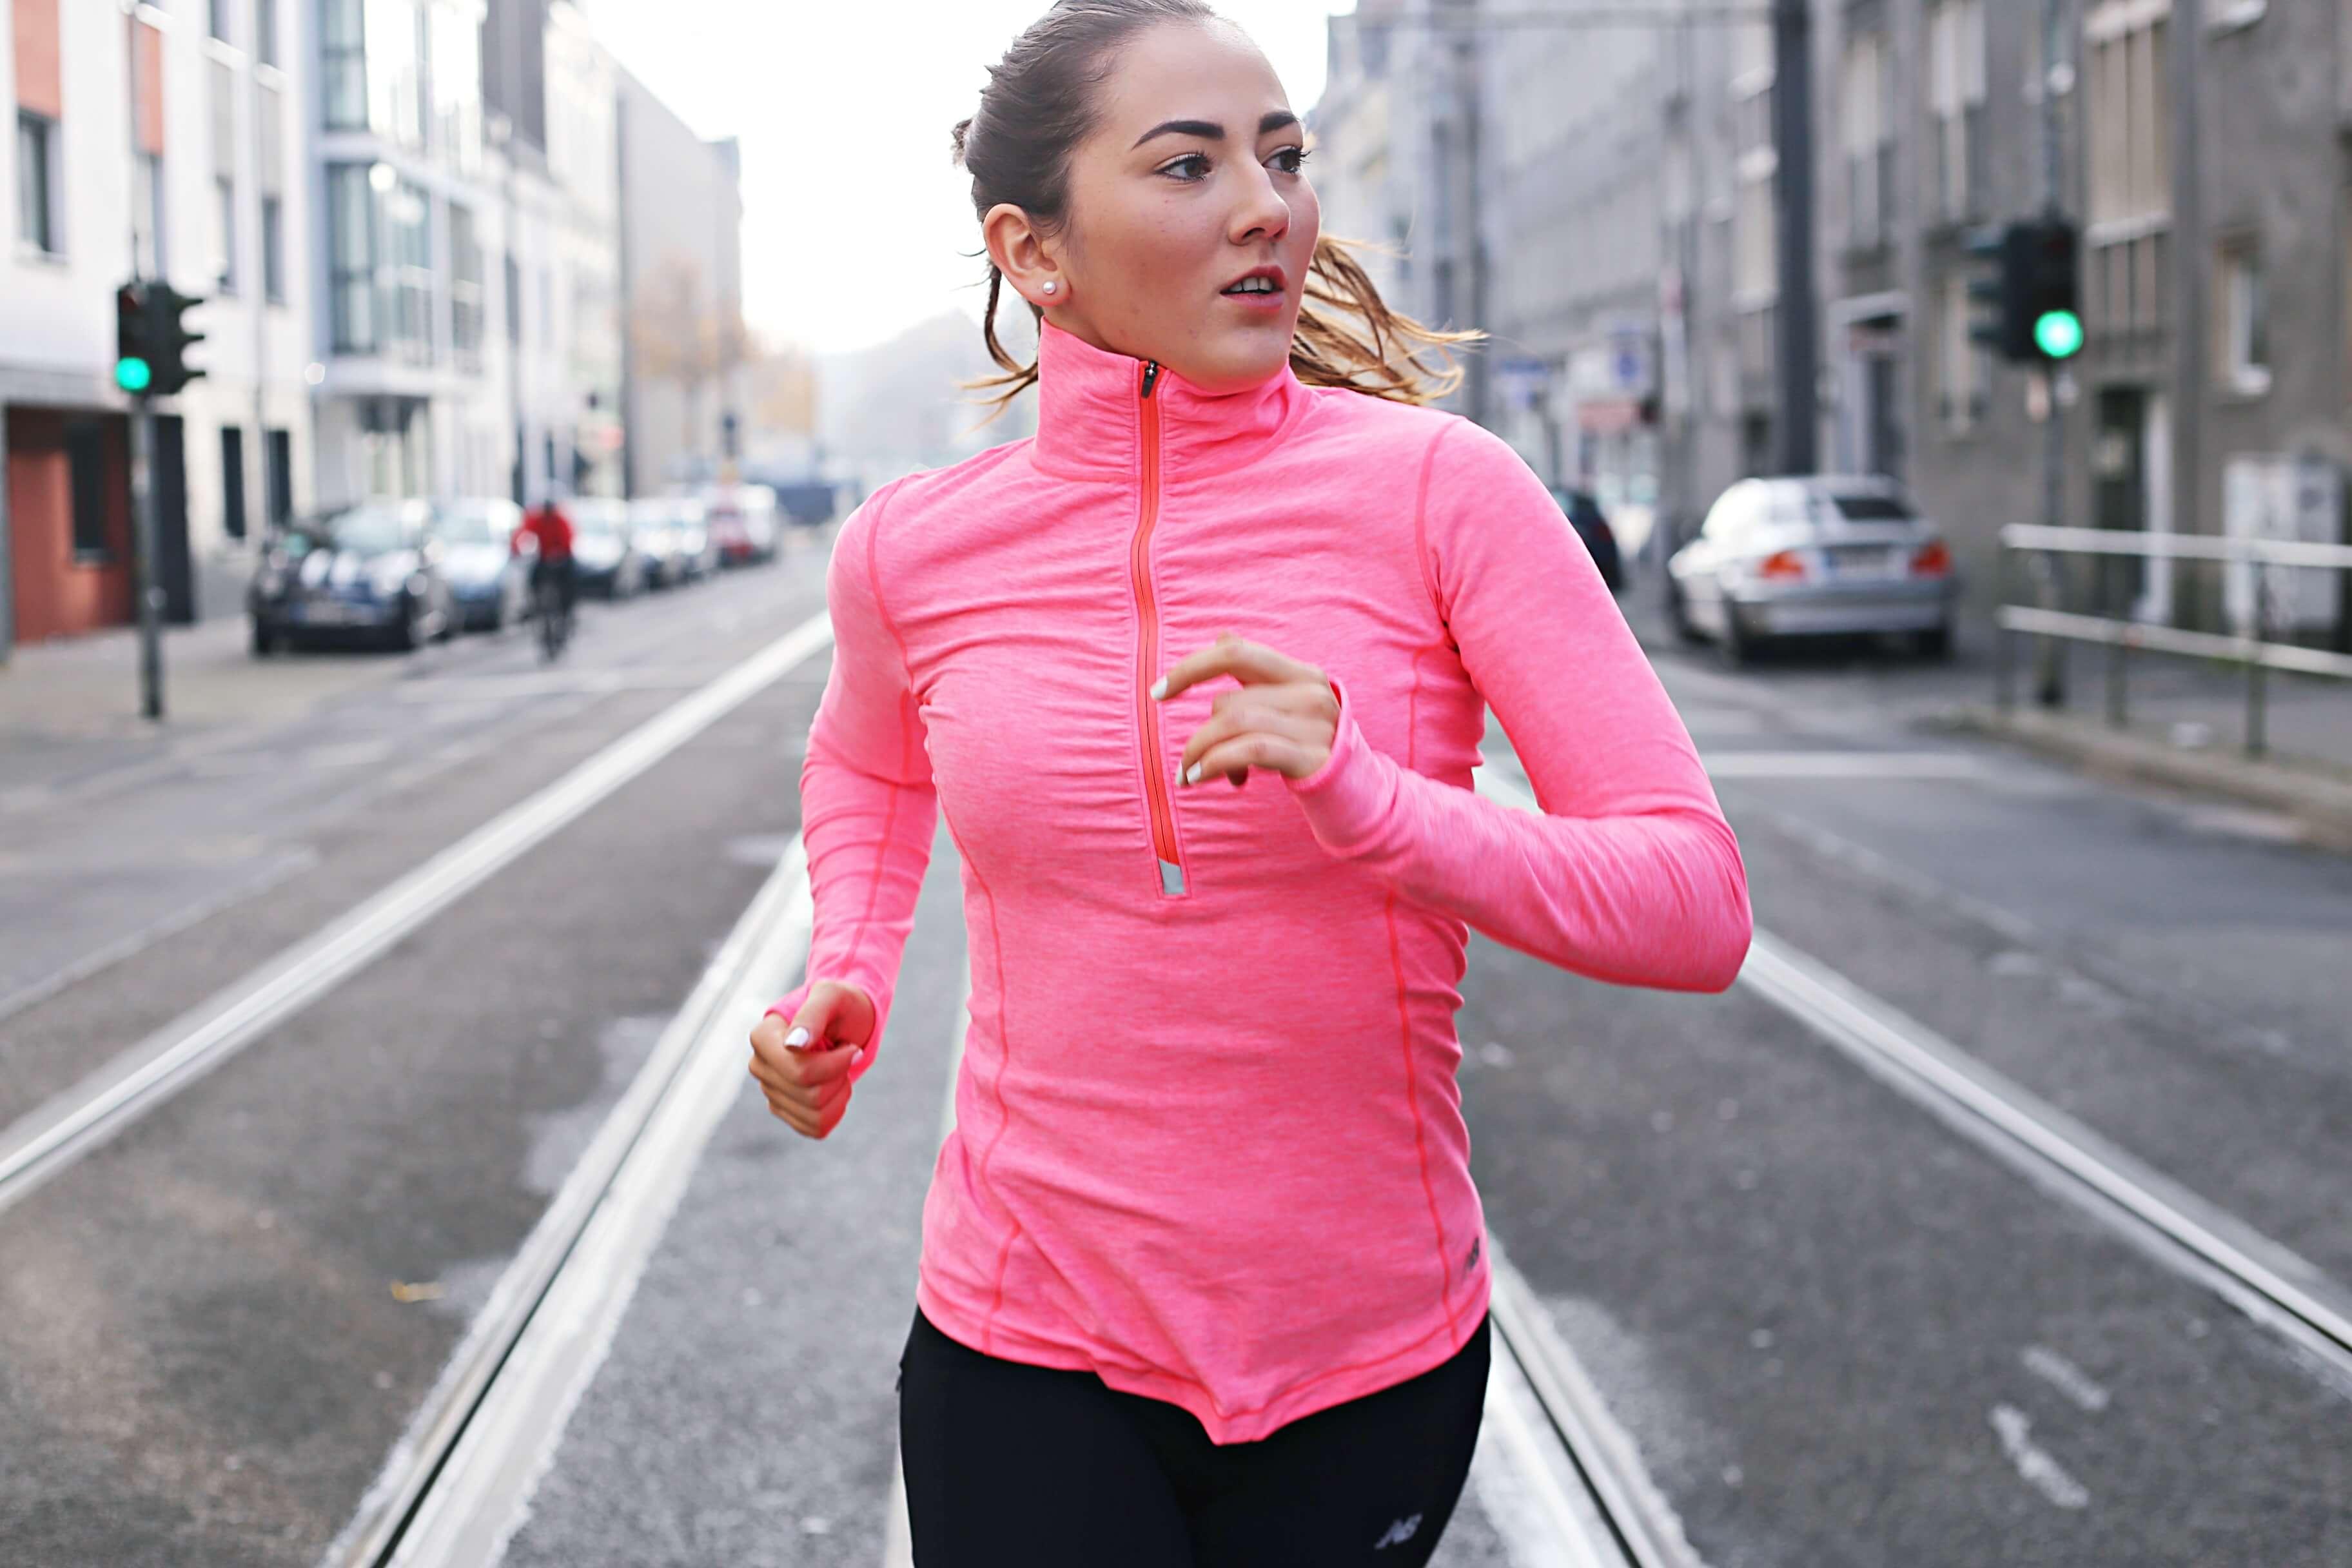 halbmarathon-new-balance-running-outfit